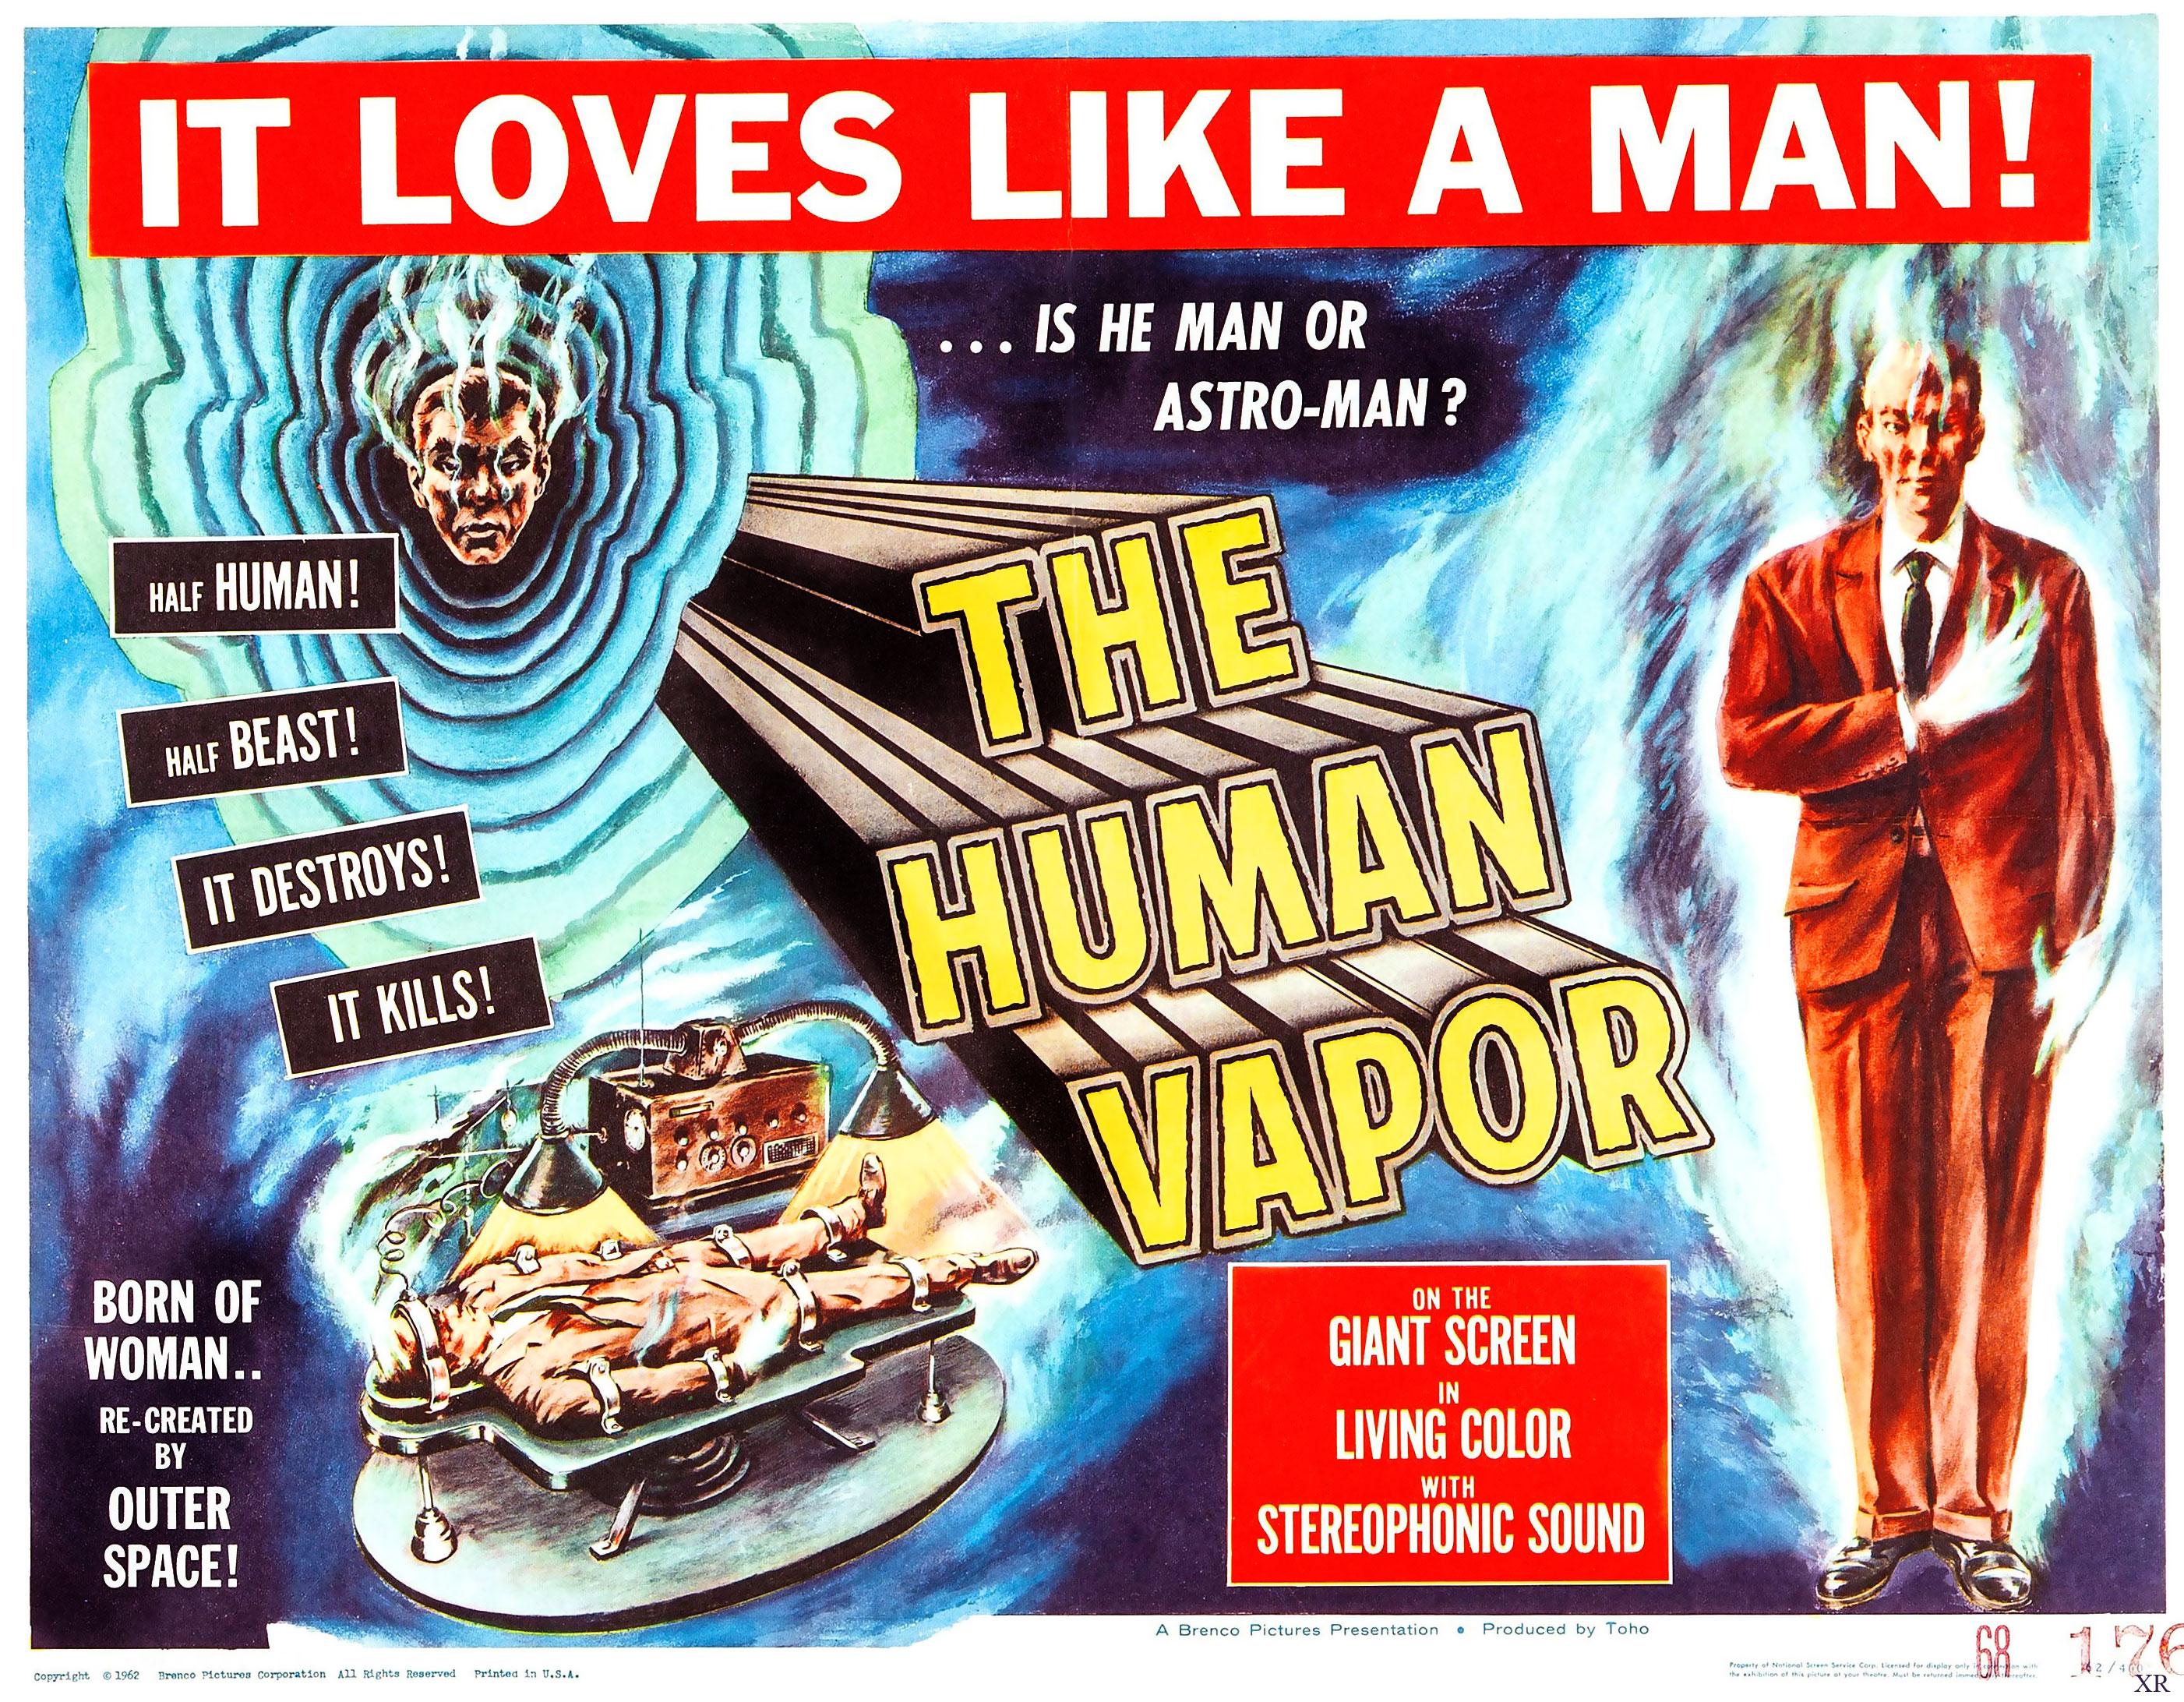 Wallpaper Sf Illustration Vintage Space Astronaut Aliens Retro NASA Nostalgia 1940s 1950s Spacestation Scifi Americana Sciencefiction